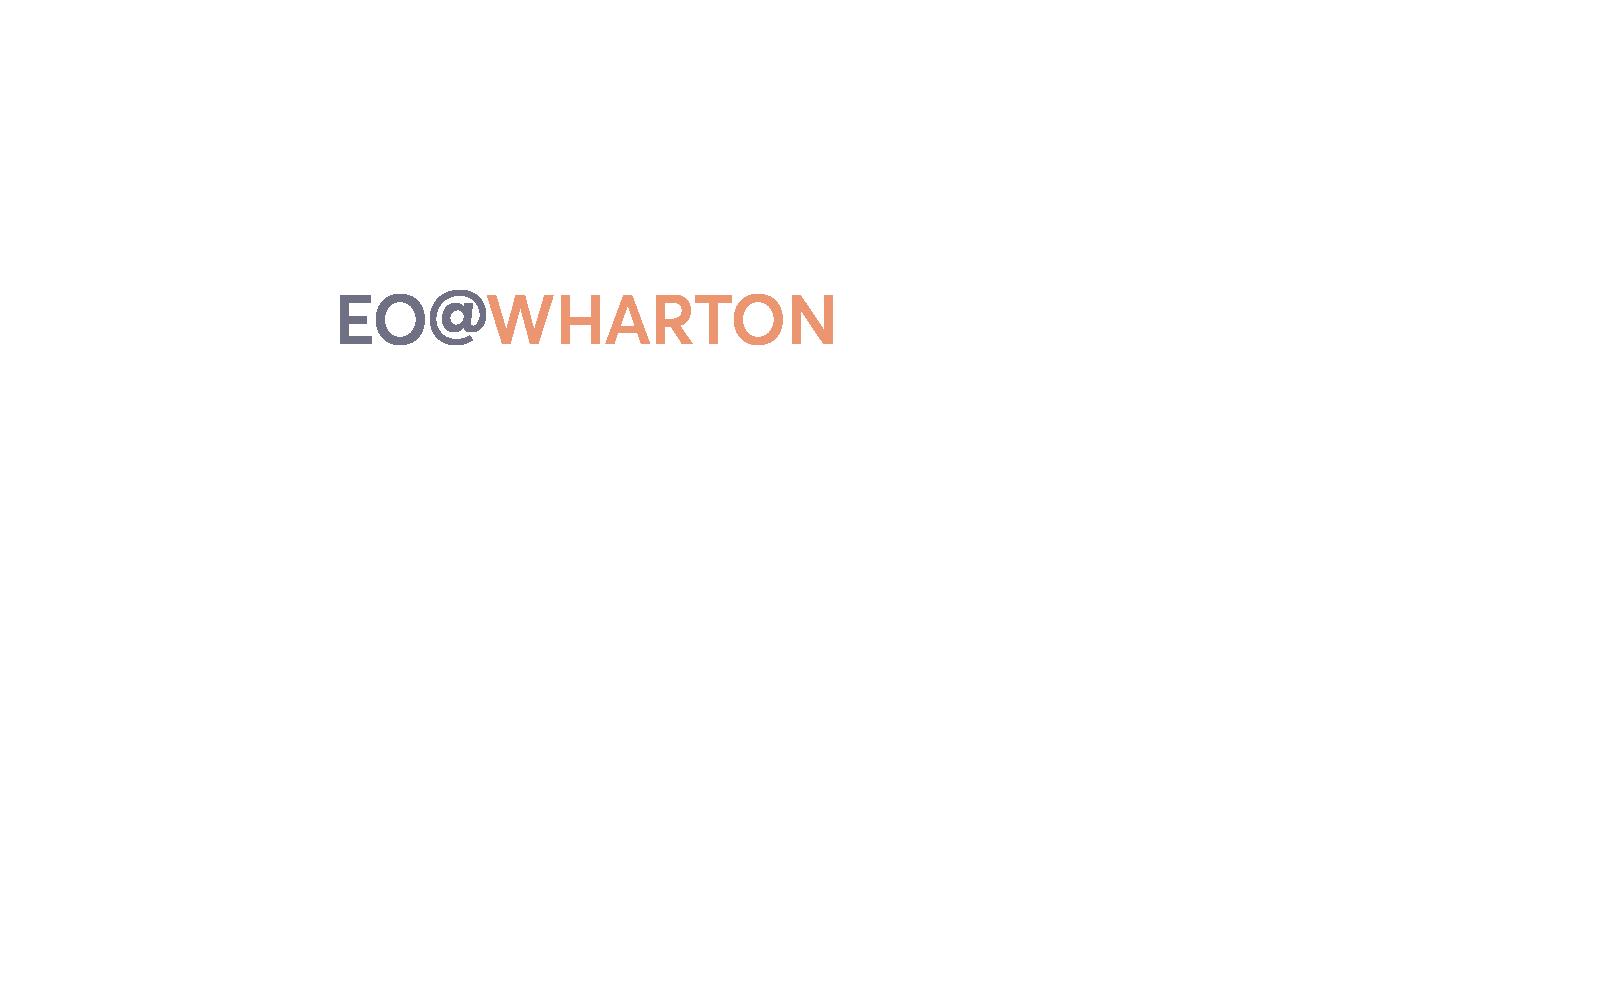 EO@Wharton type treatment